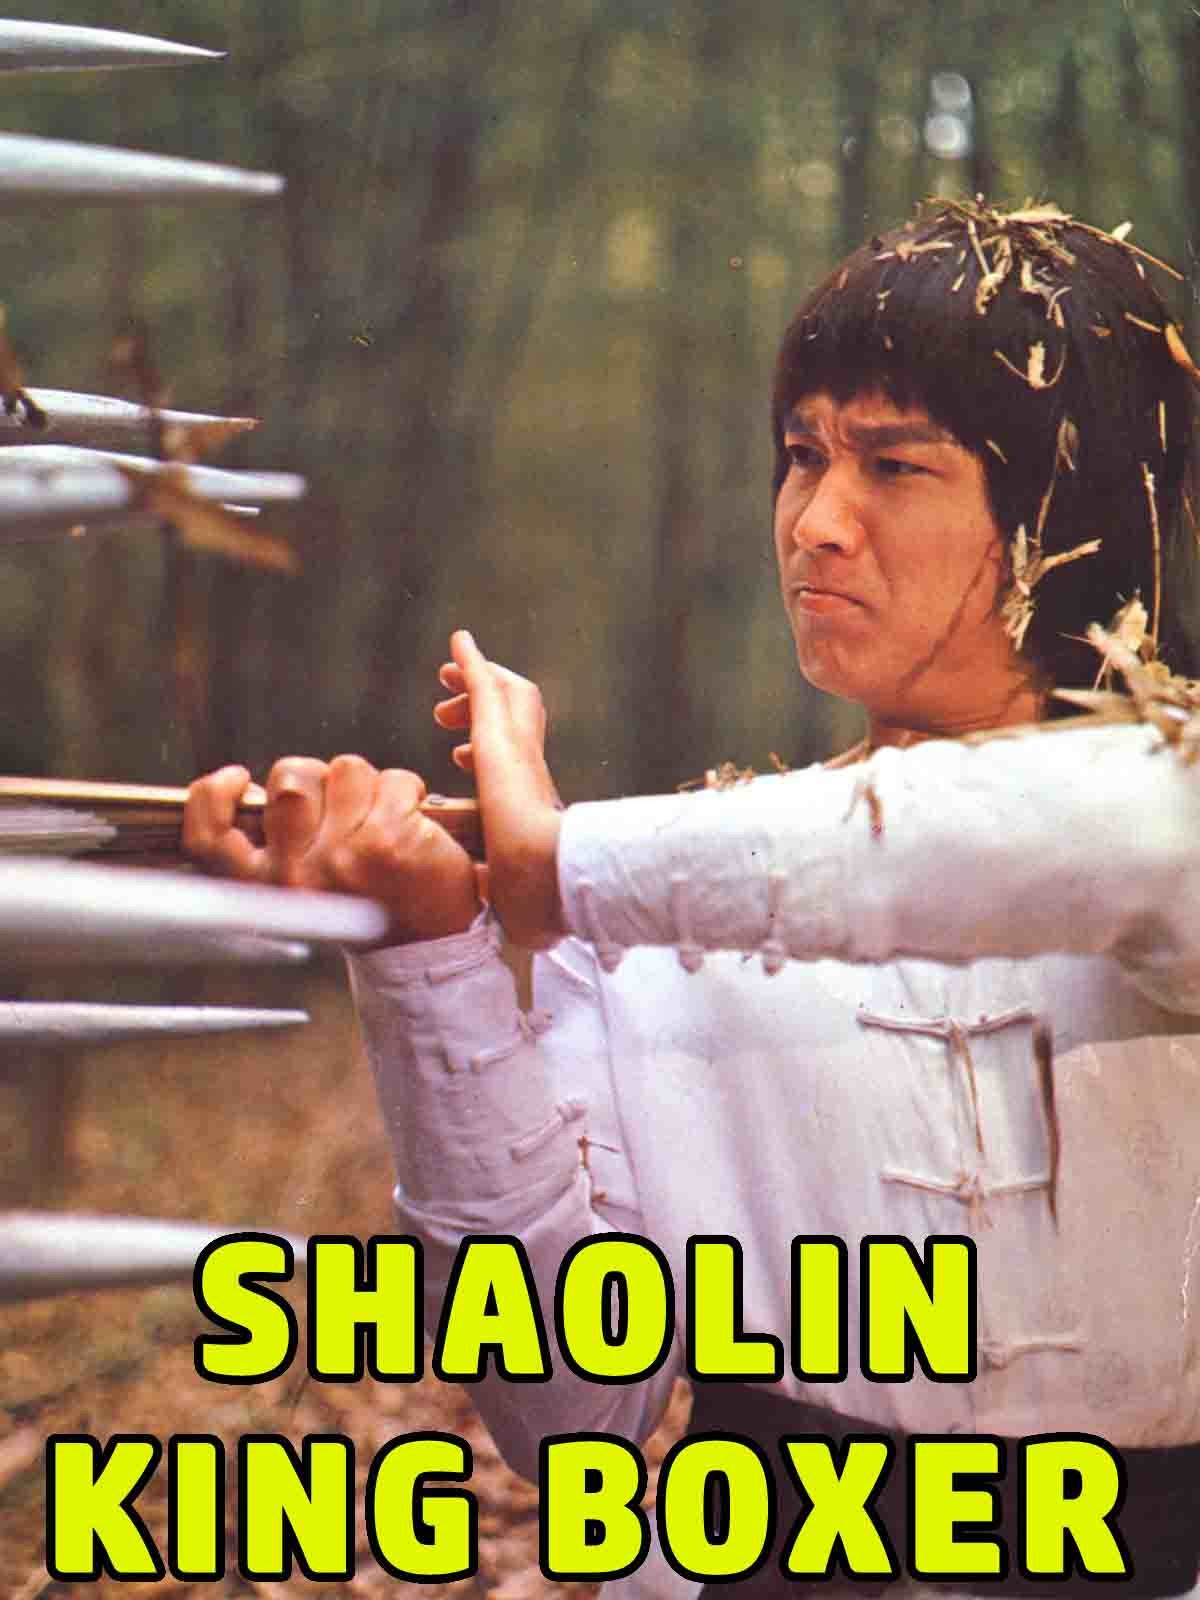 Shaolin King Boxer